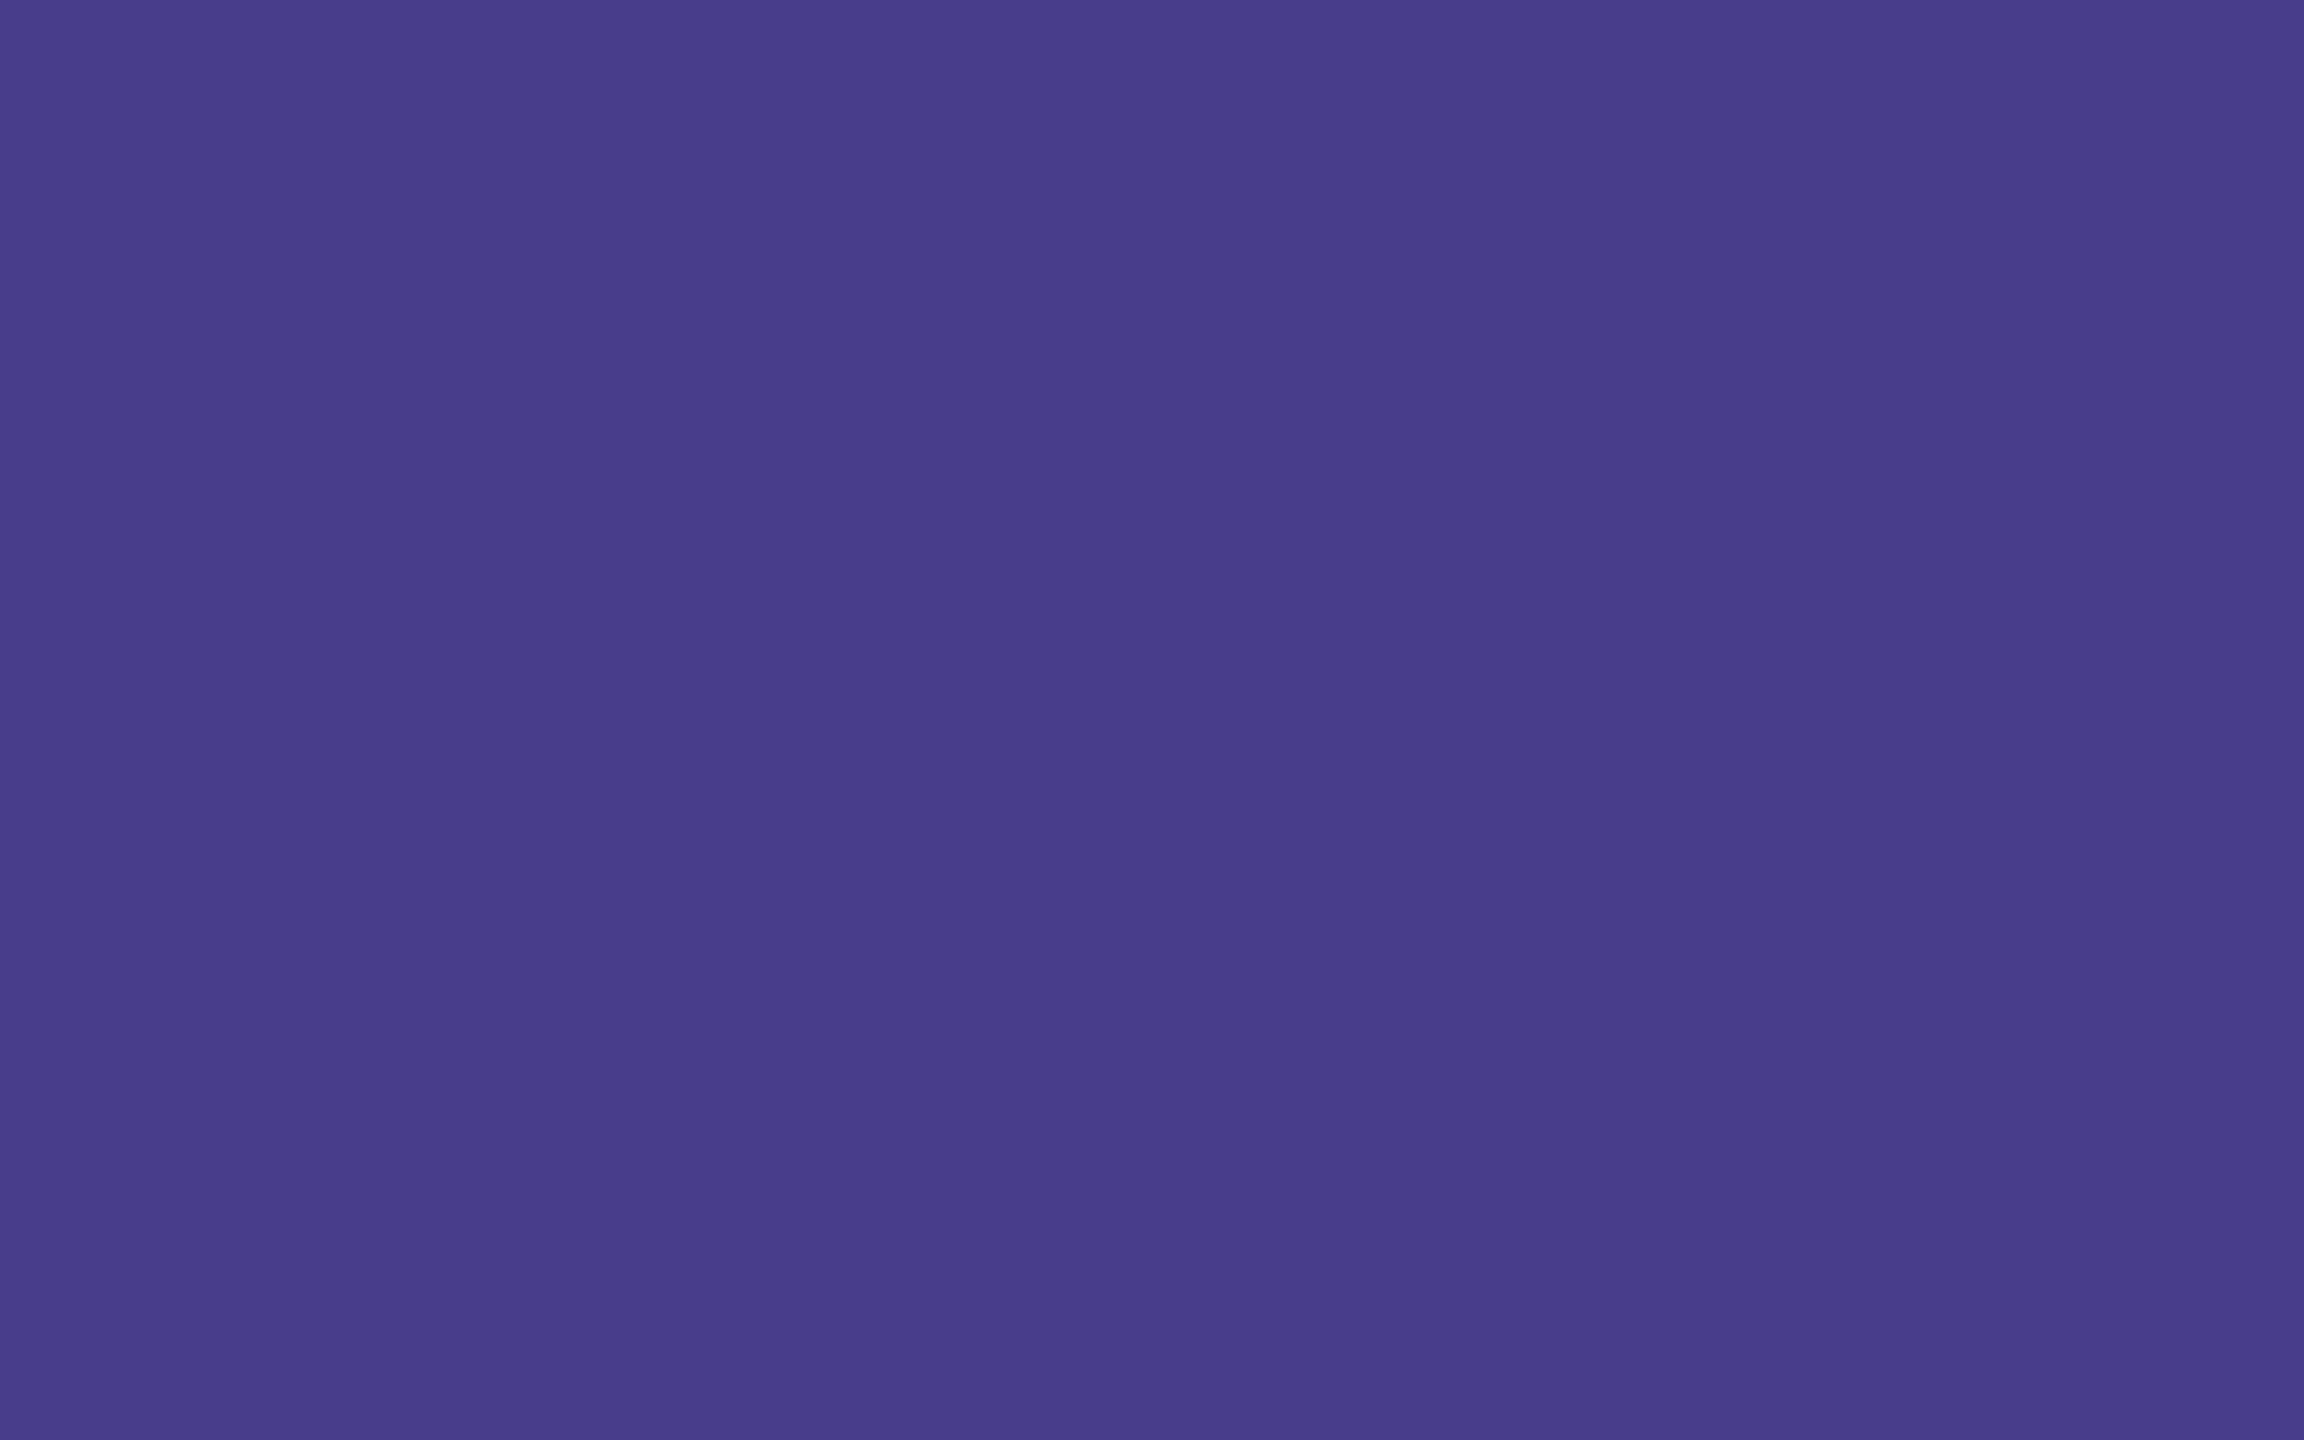 2304x1440 Dark Slate Blue Solid Color Background